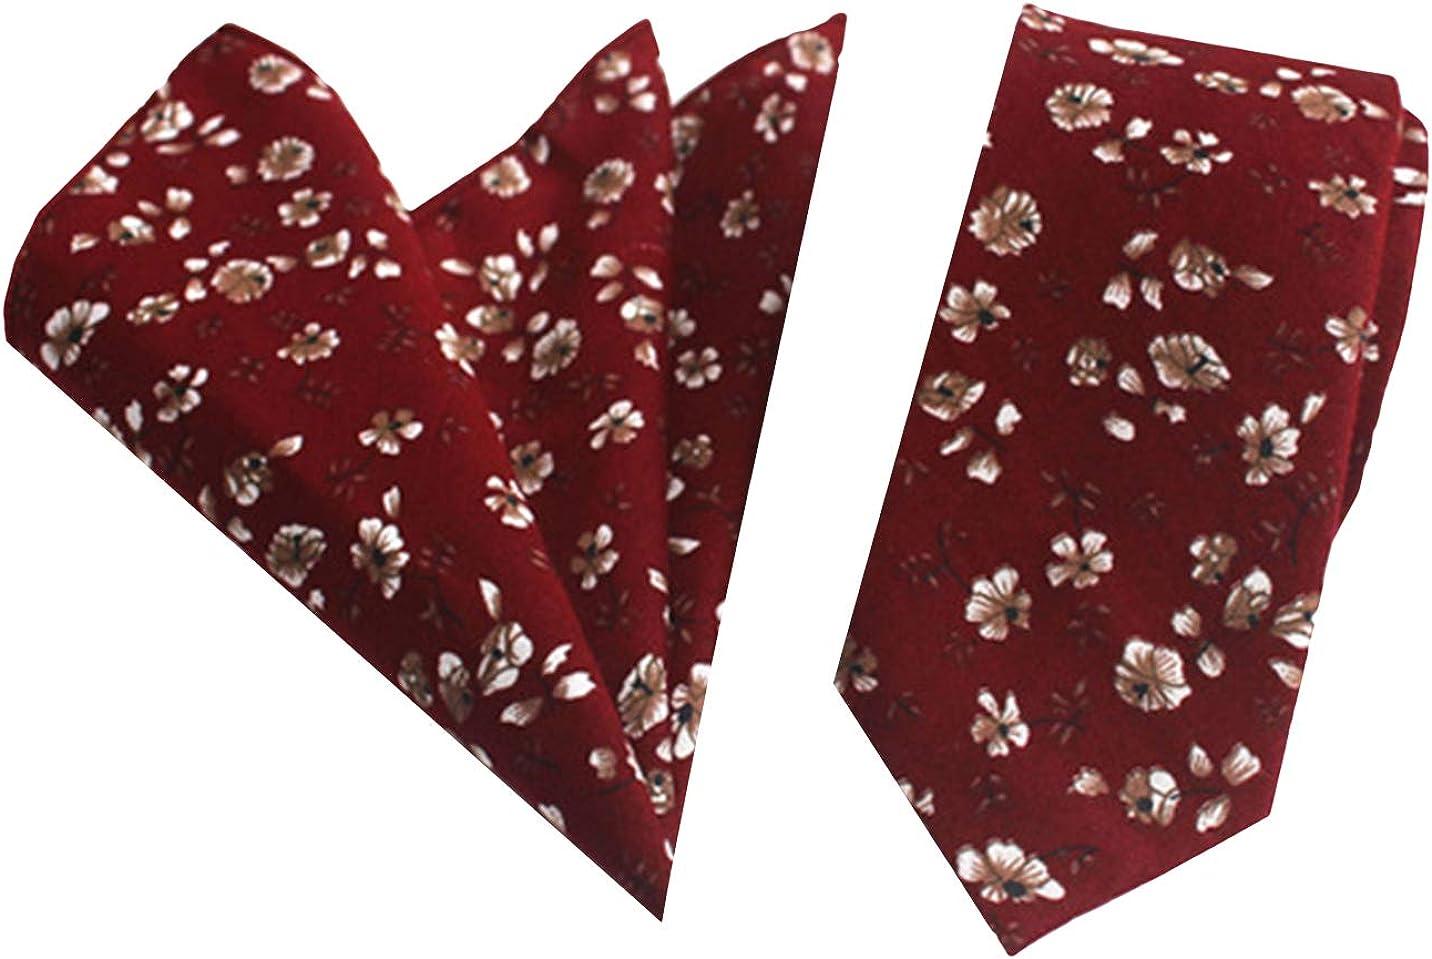 L04BABY Mens Floral Tie Handkerchief Flower Cotton Necktie and Pocket Square Set